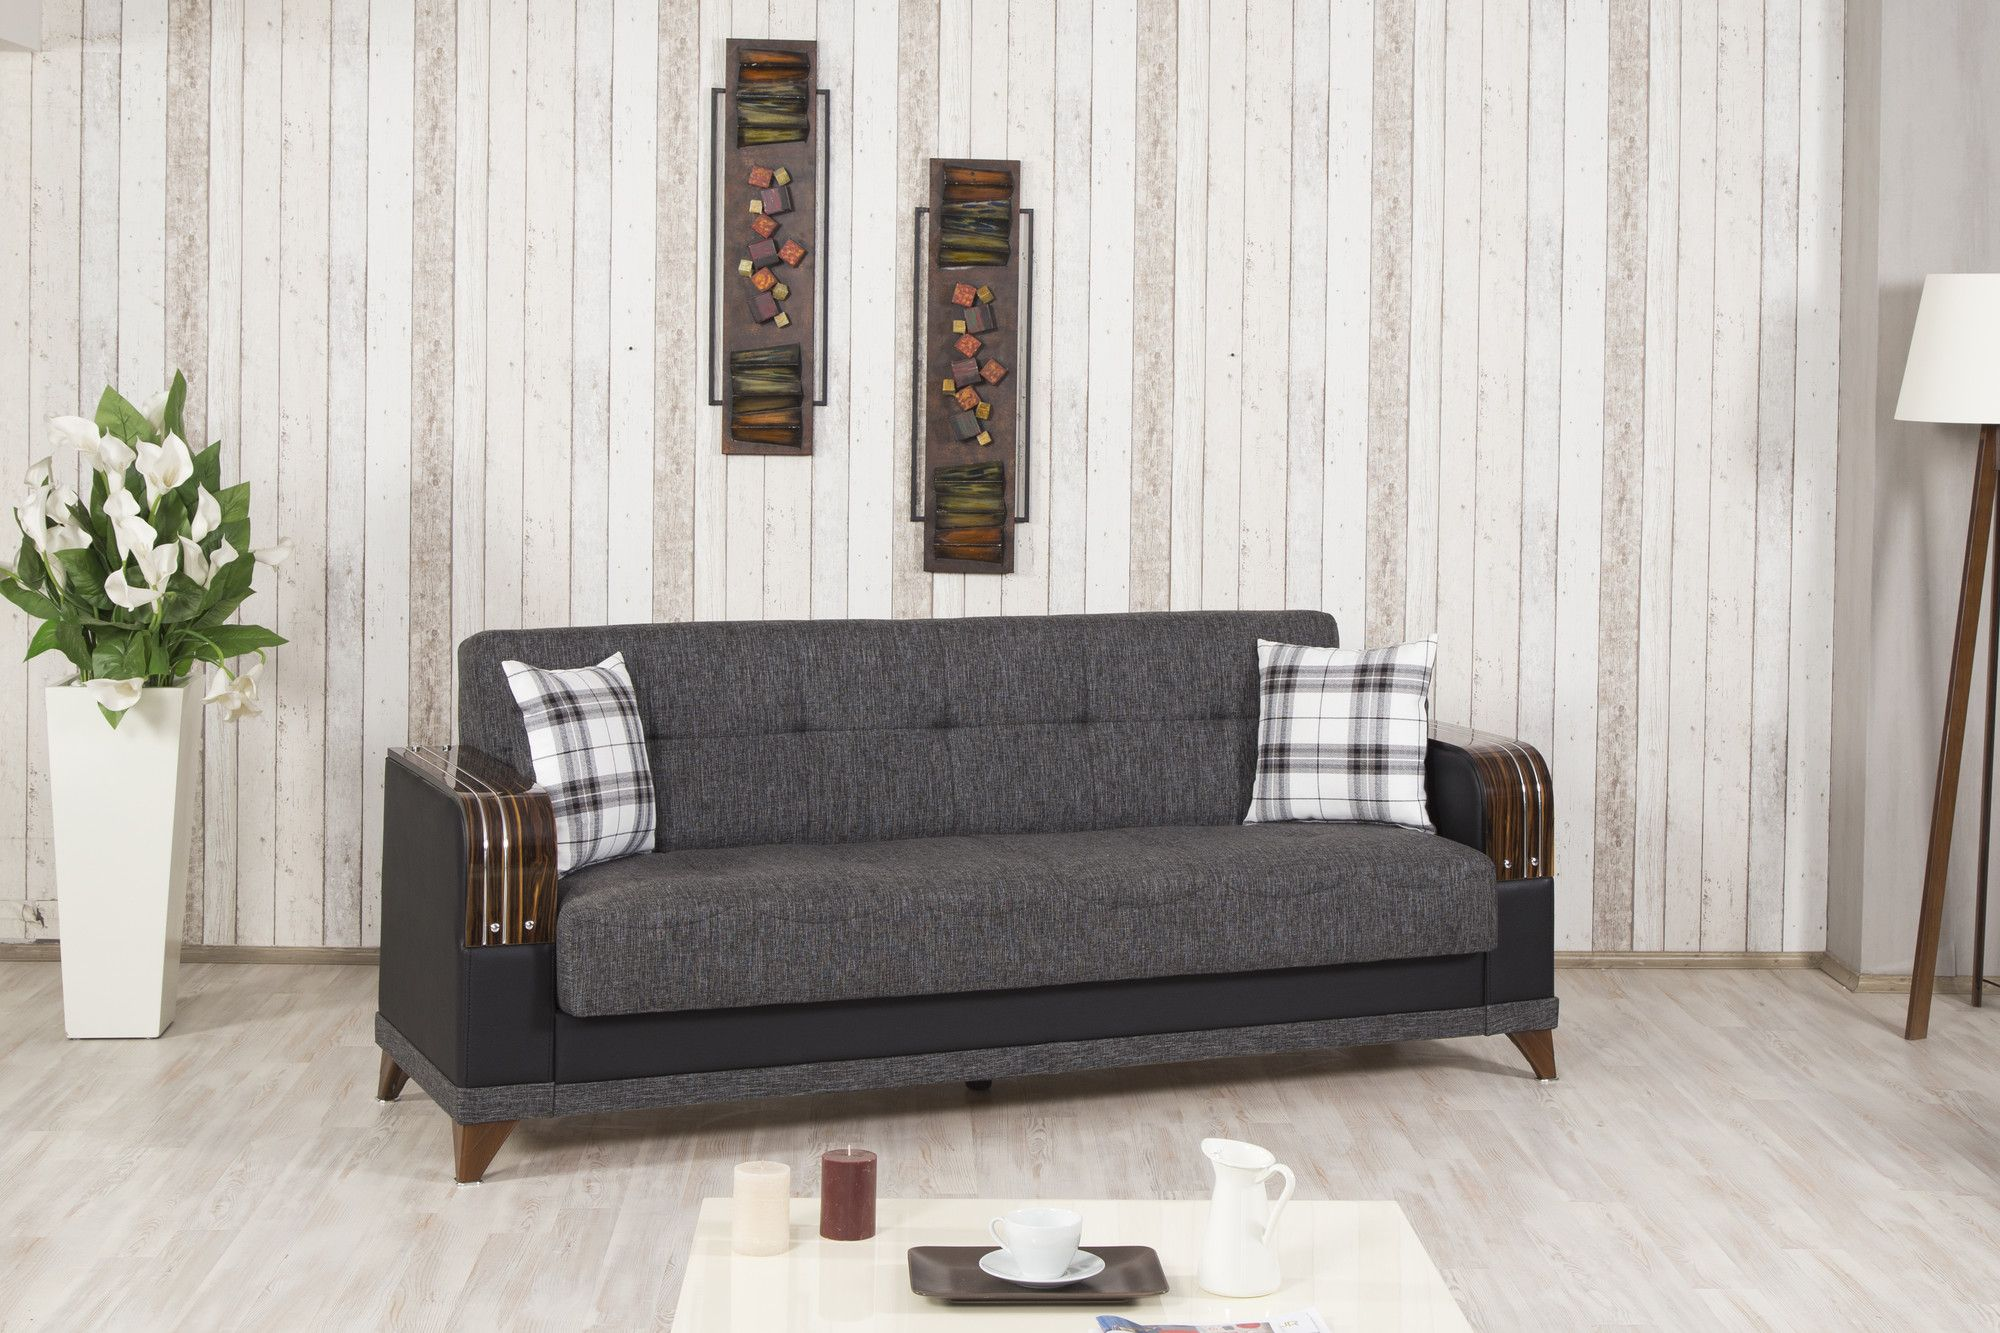 Almira Sofa Bed in Elena Gray by Casamode Furniture